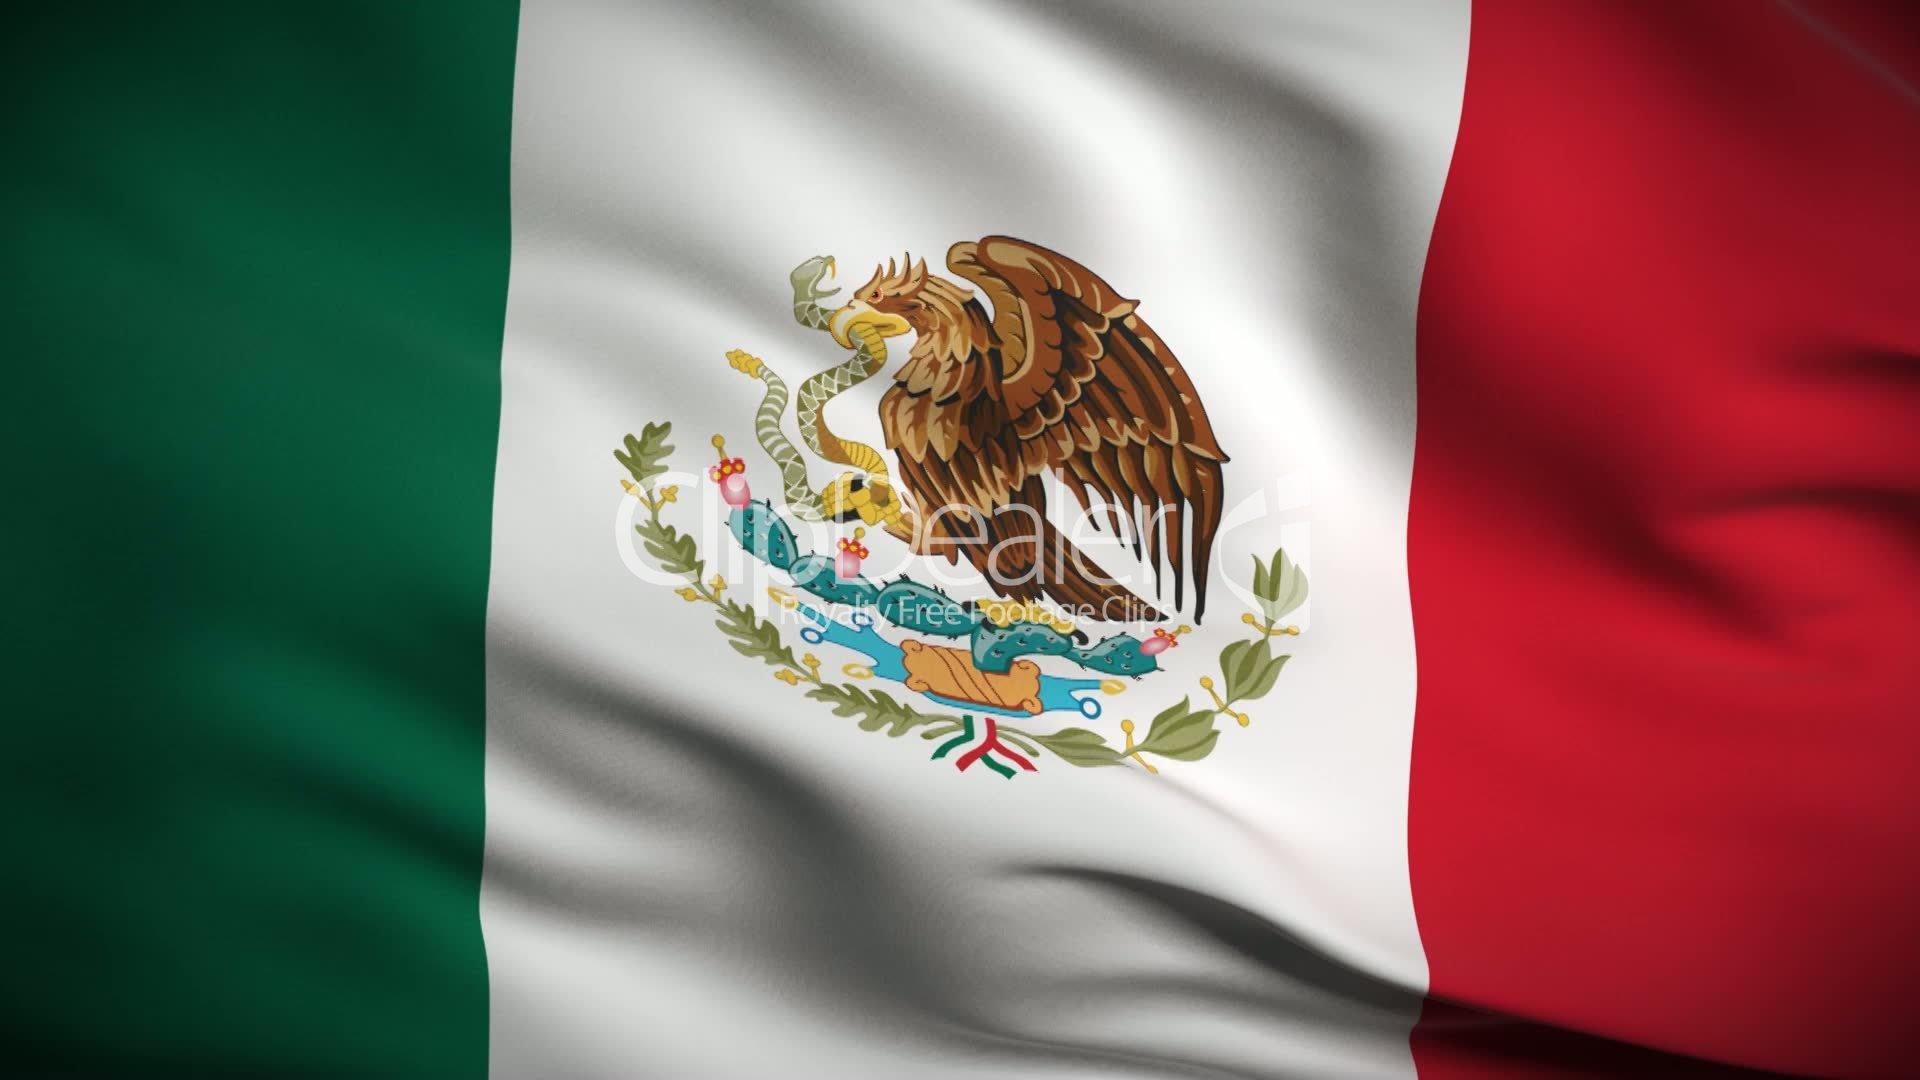 mexico flag mexico flag mexico flag share mexico flag wallpaper 1920x1080